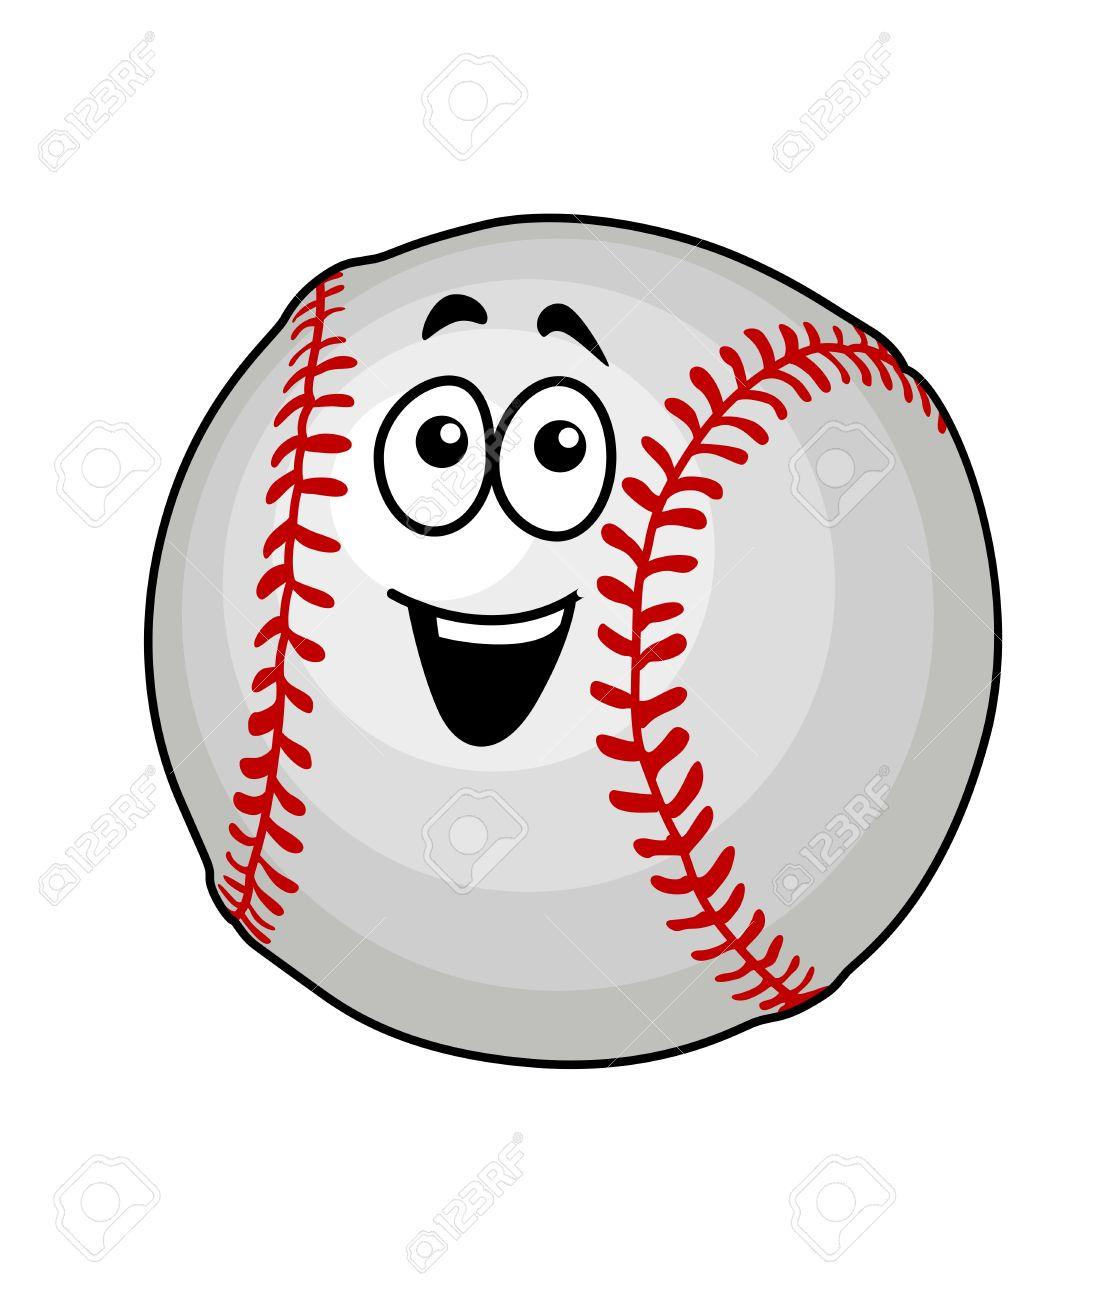 cartoon vector illustration of a fun happy baseball ball with